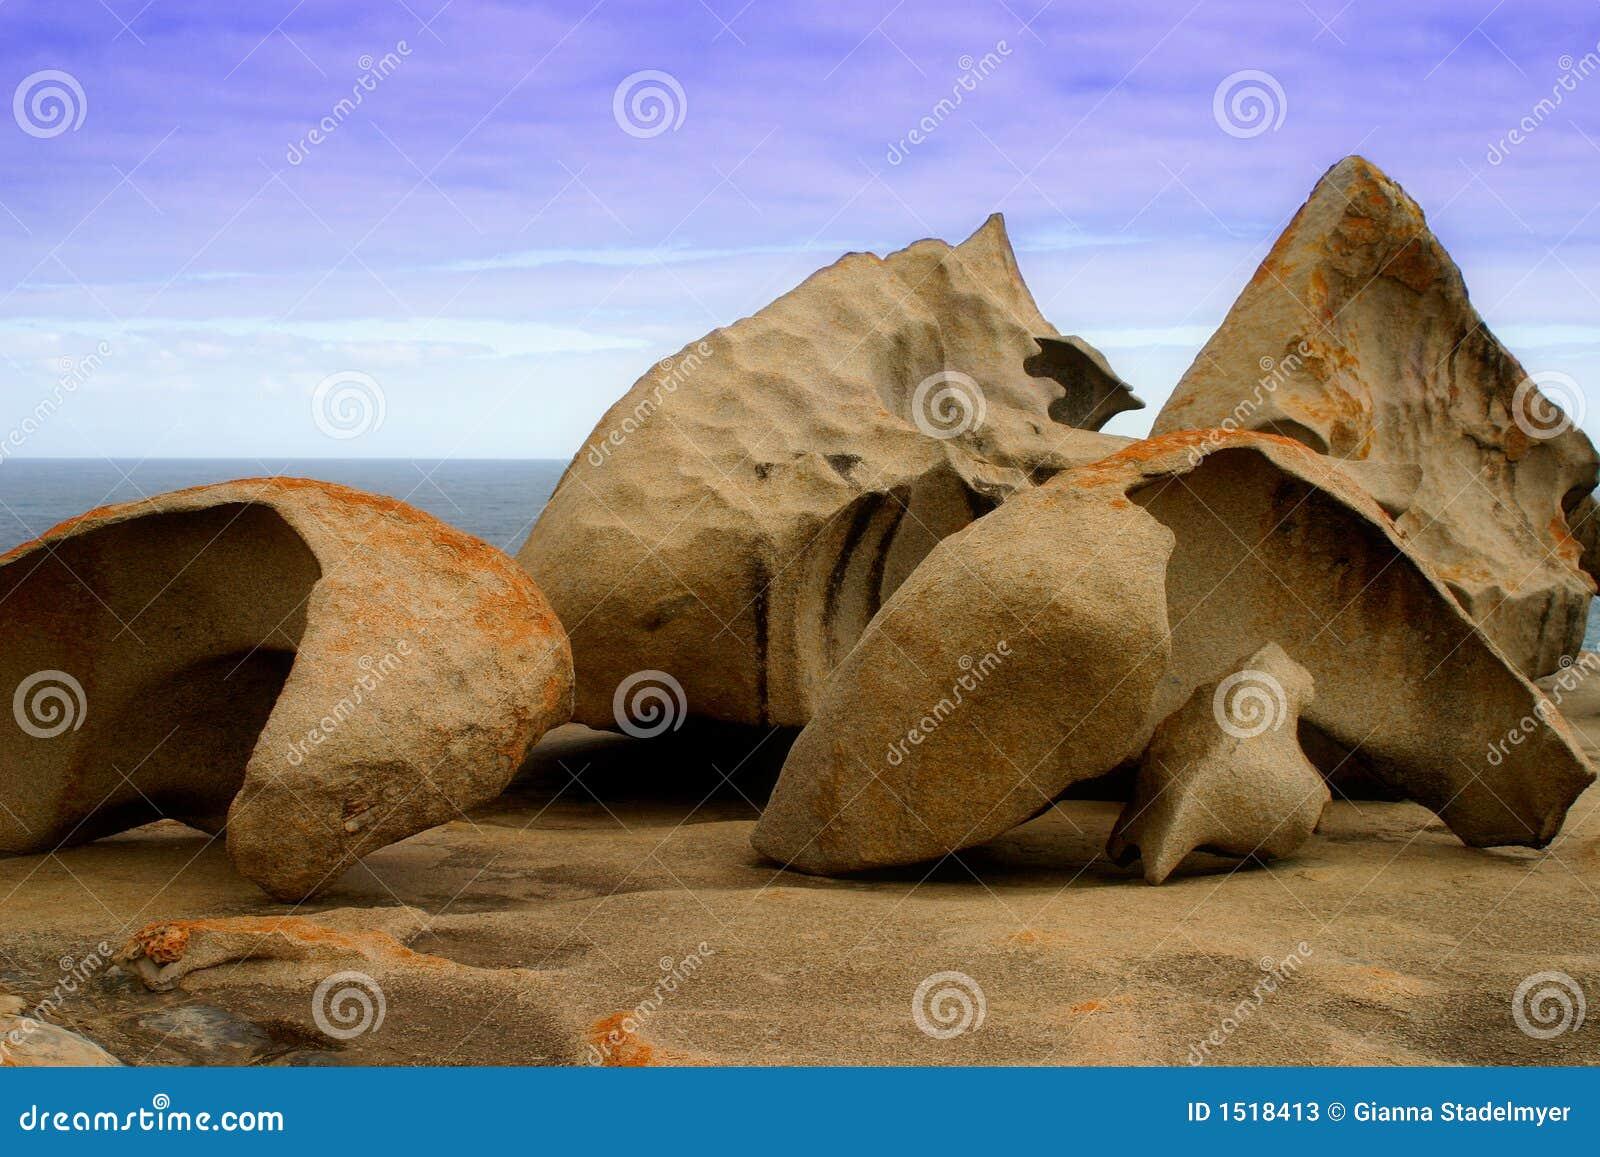 Remarkable Rock Formation